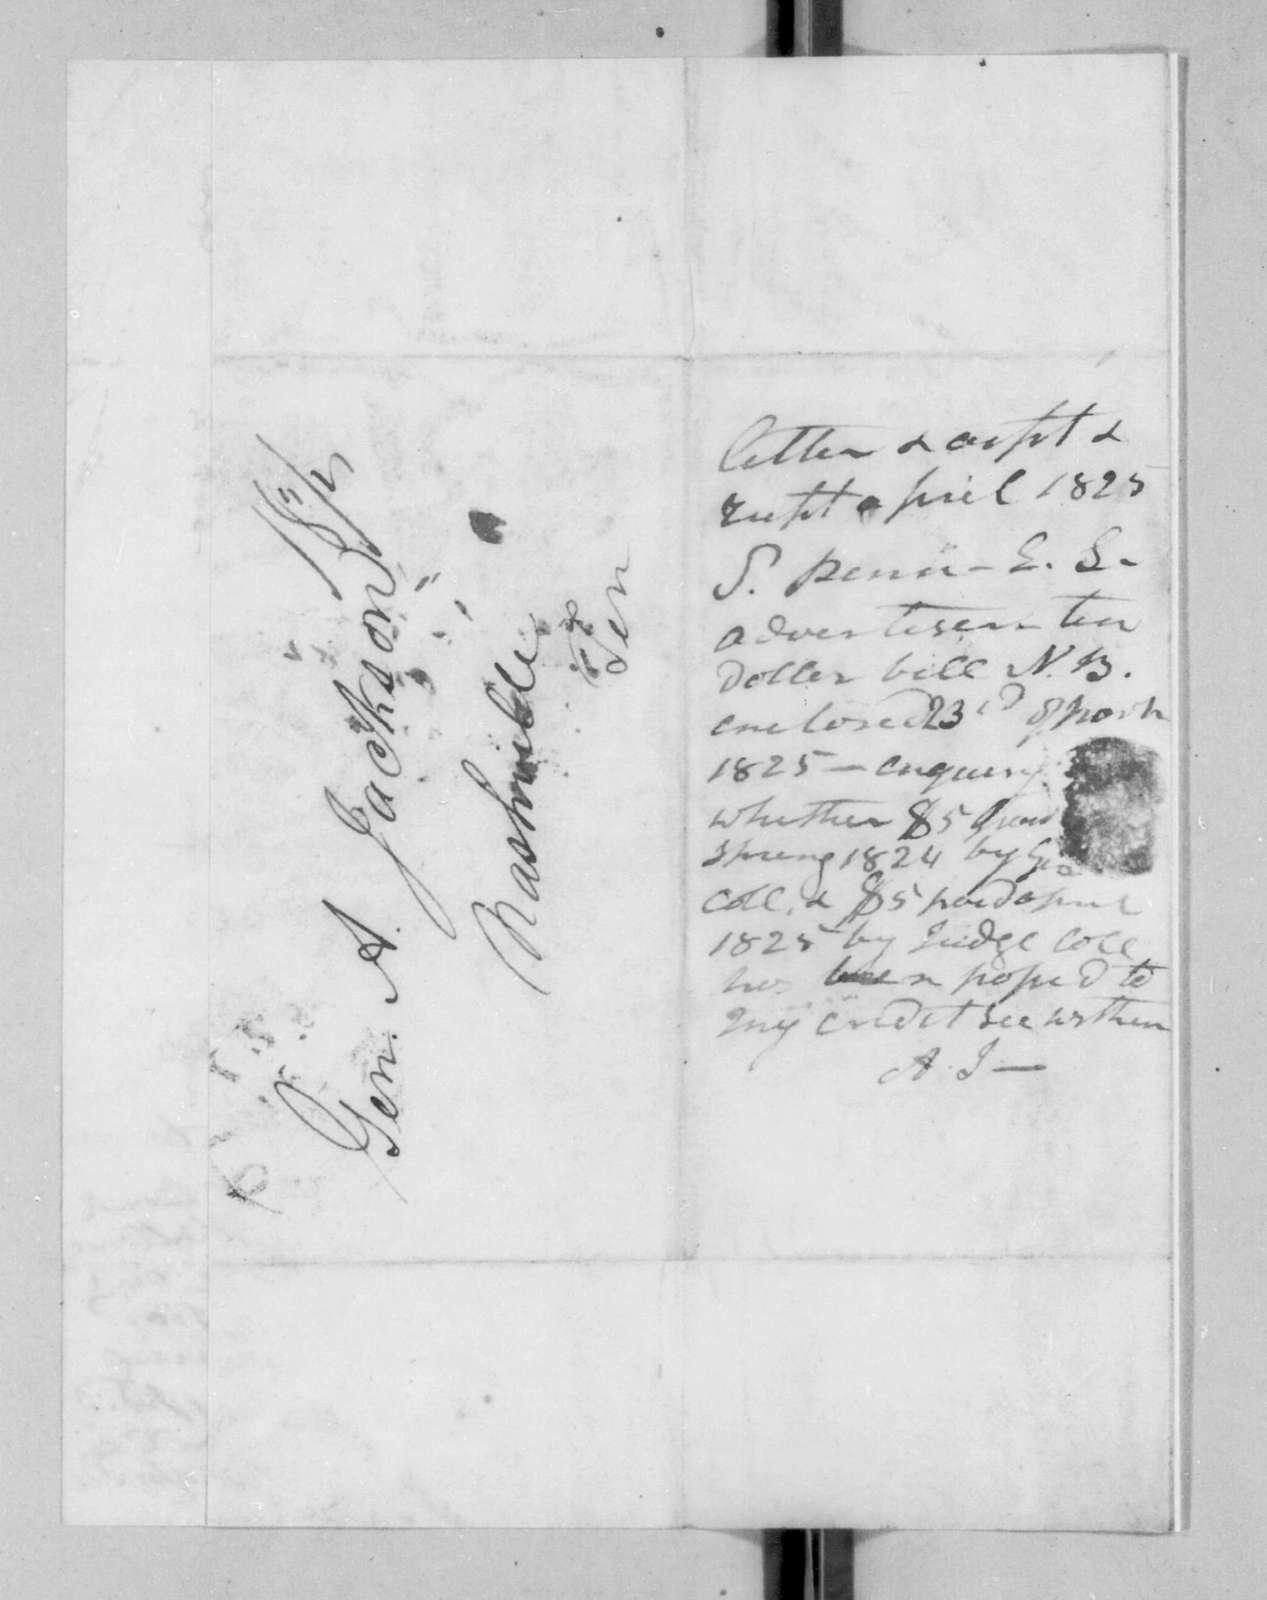 Shadrach Penn, Jr. to Andrew Jackson, November 14, 1825